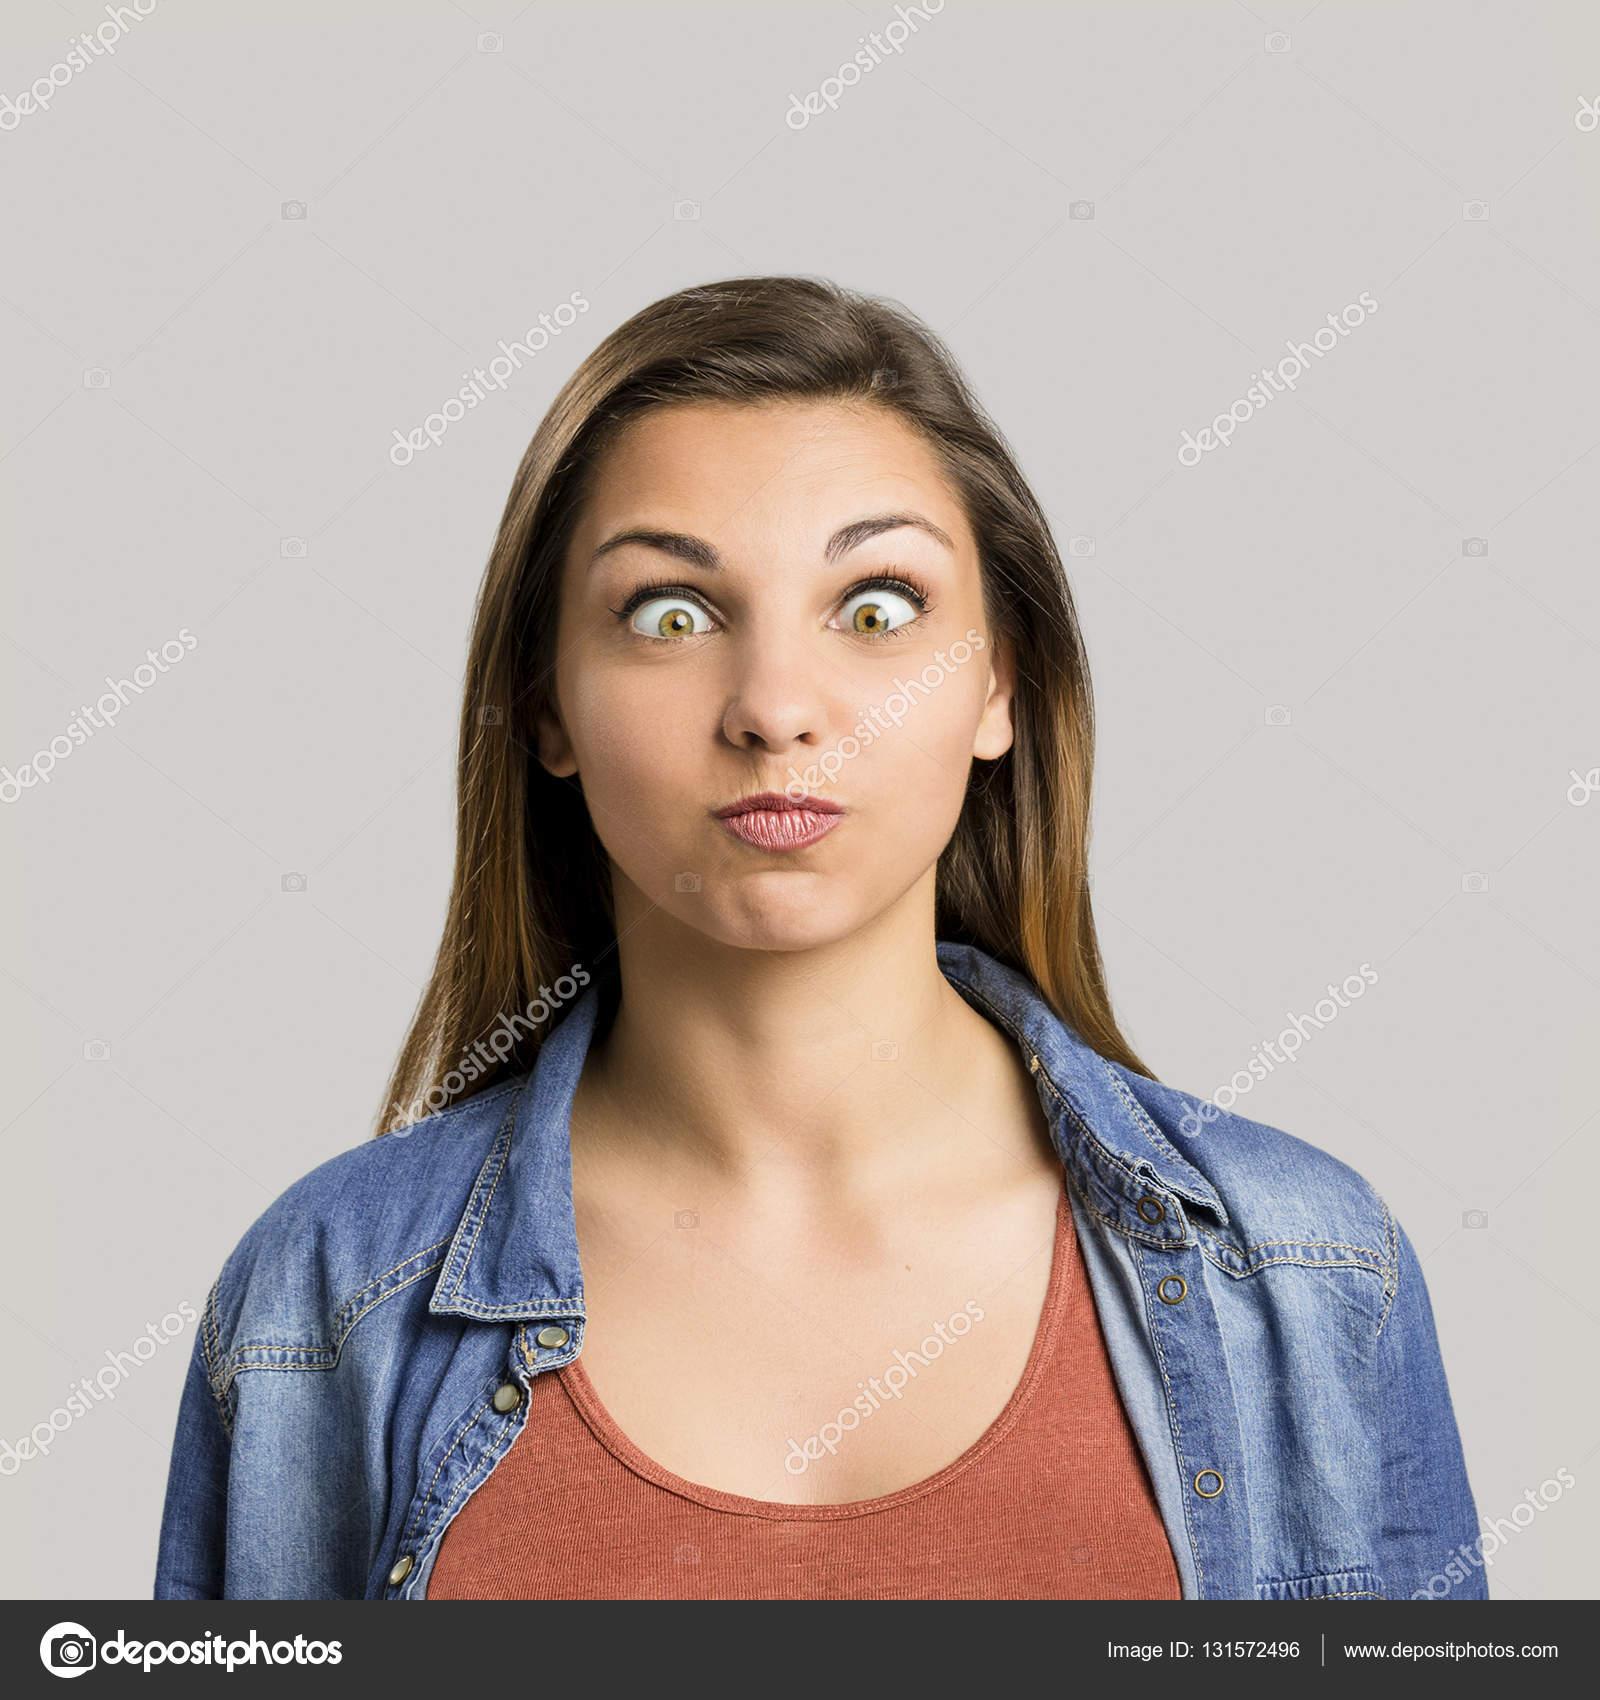 Pics: crazy eyes   Woman making crazy eyes — Stock Photo